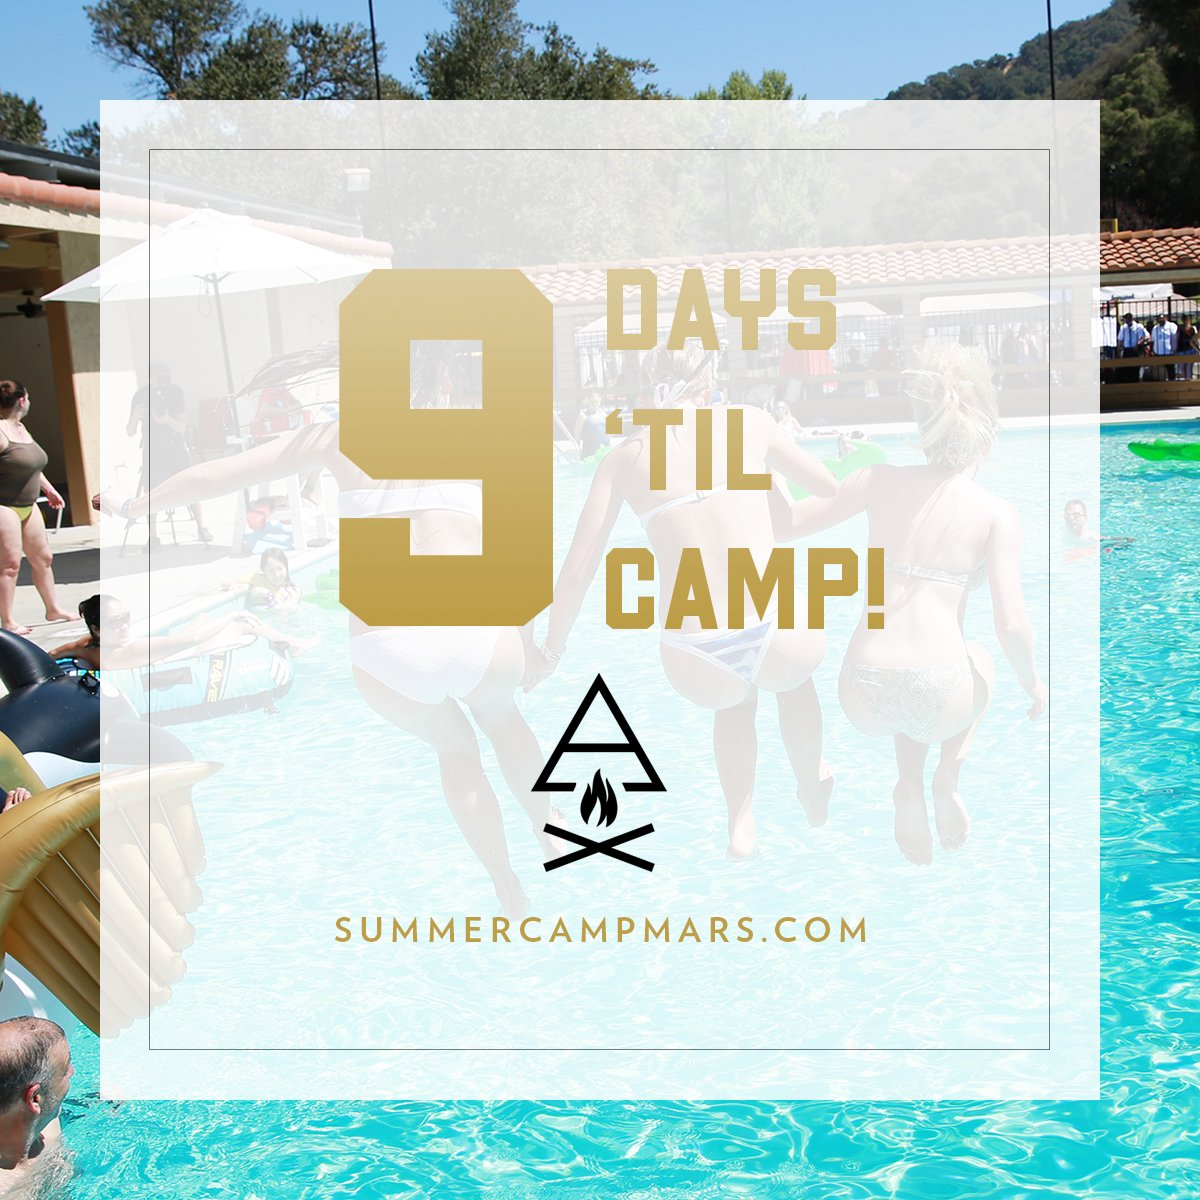 Holy guacamole 9 DAYS till @SummerCampMars!! https://t.co/KCDYtBAekt https://t.co/ABxzm9k1nN